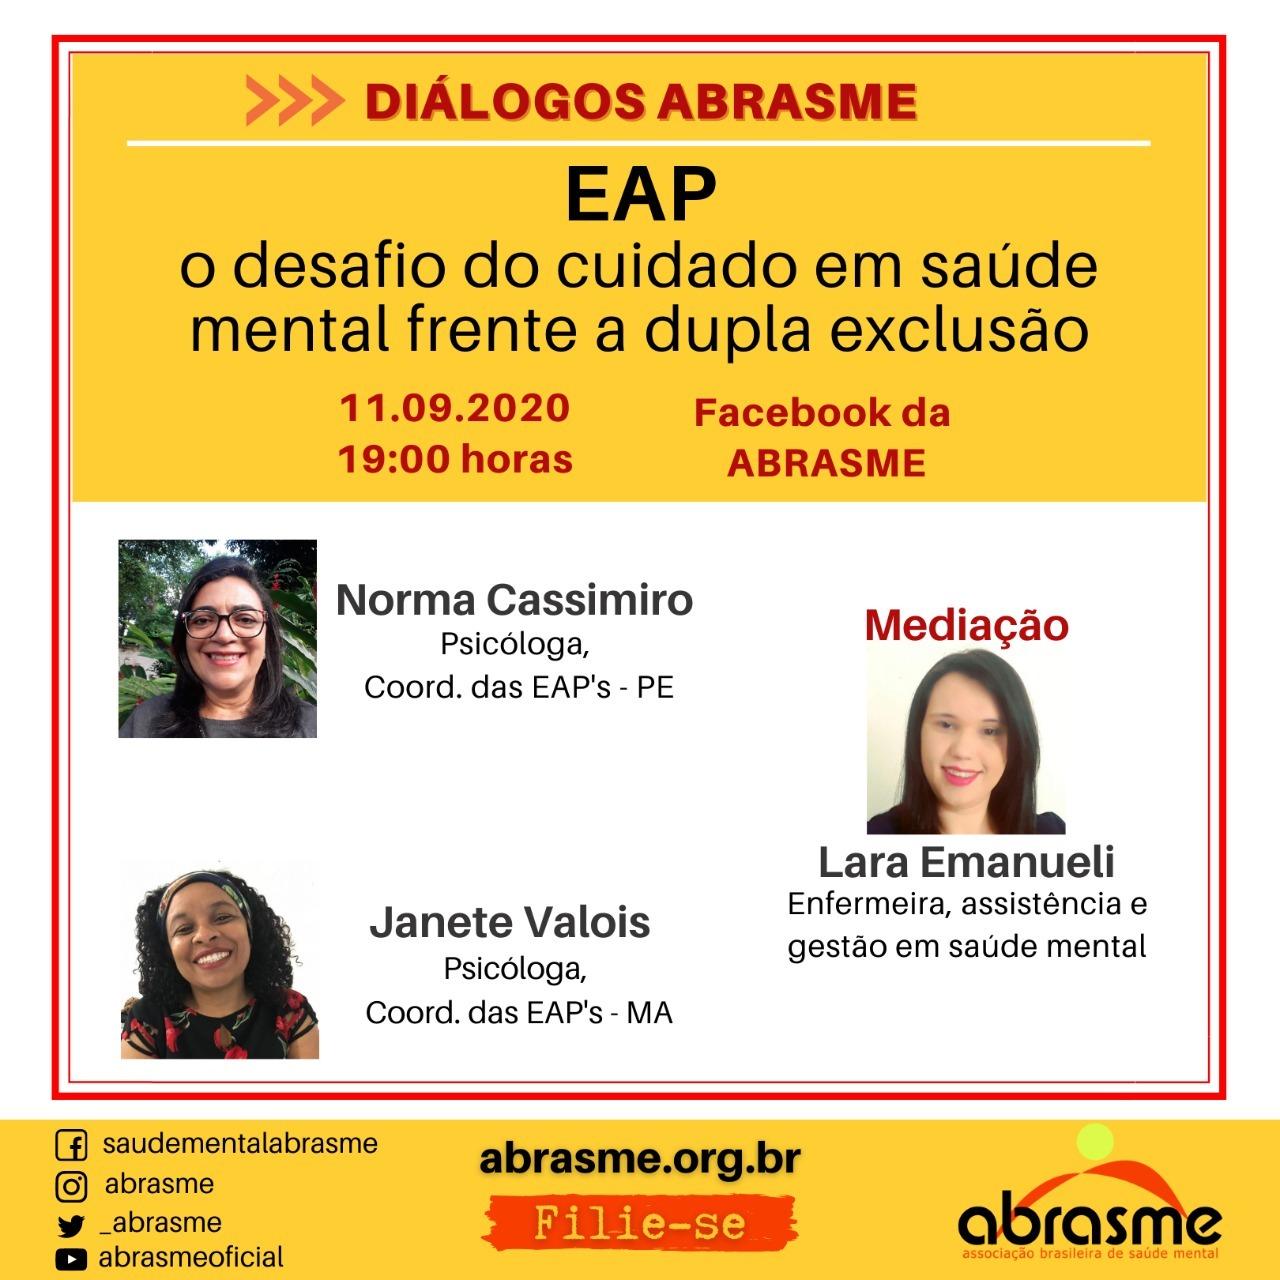 dilogo-01-1599675234.jpeg